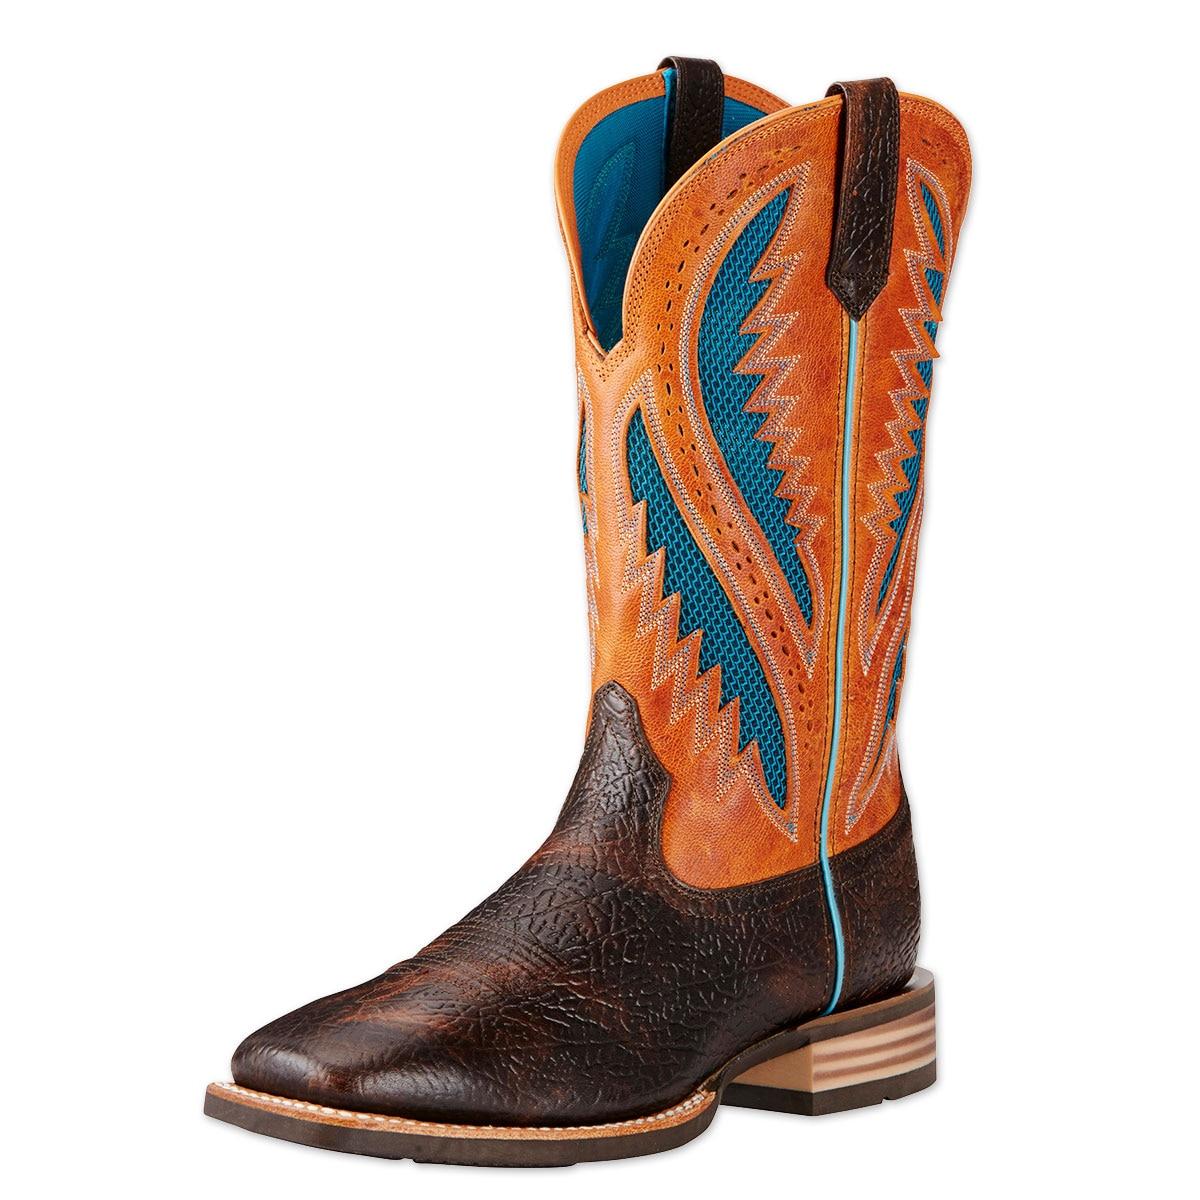 7113b6bb597 Ariat Men s Quickdraw VentTEK Boots